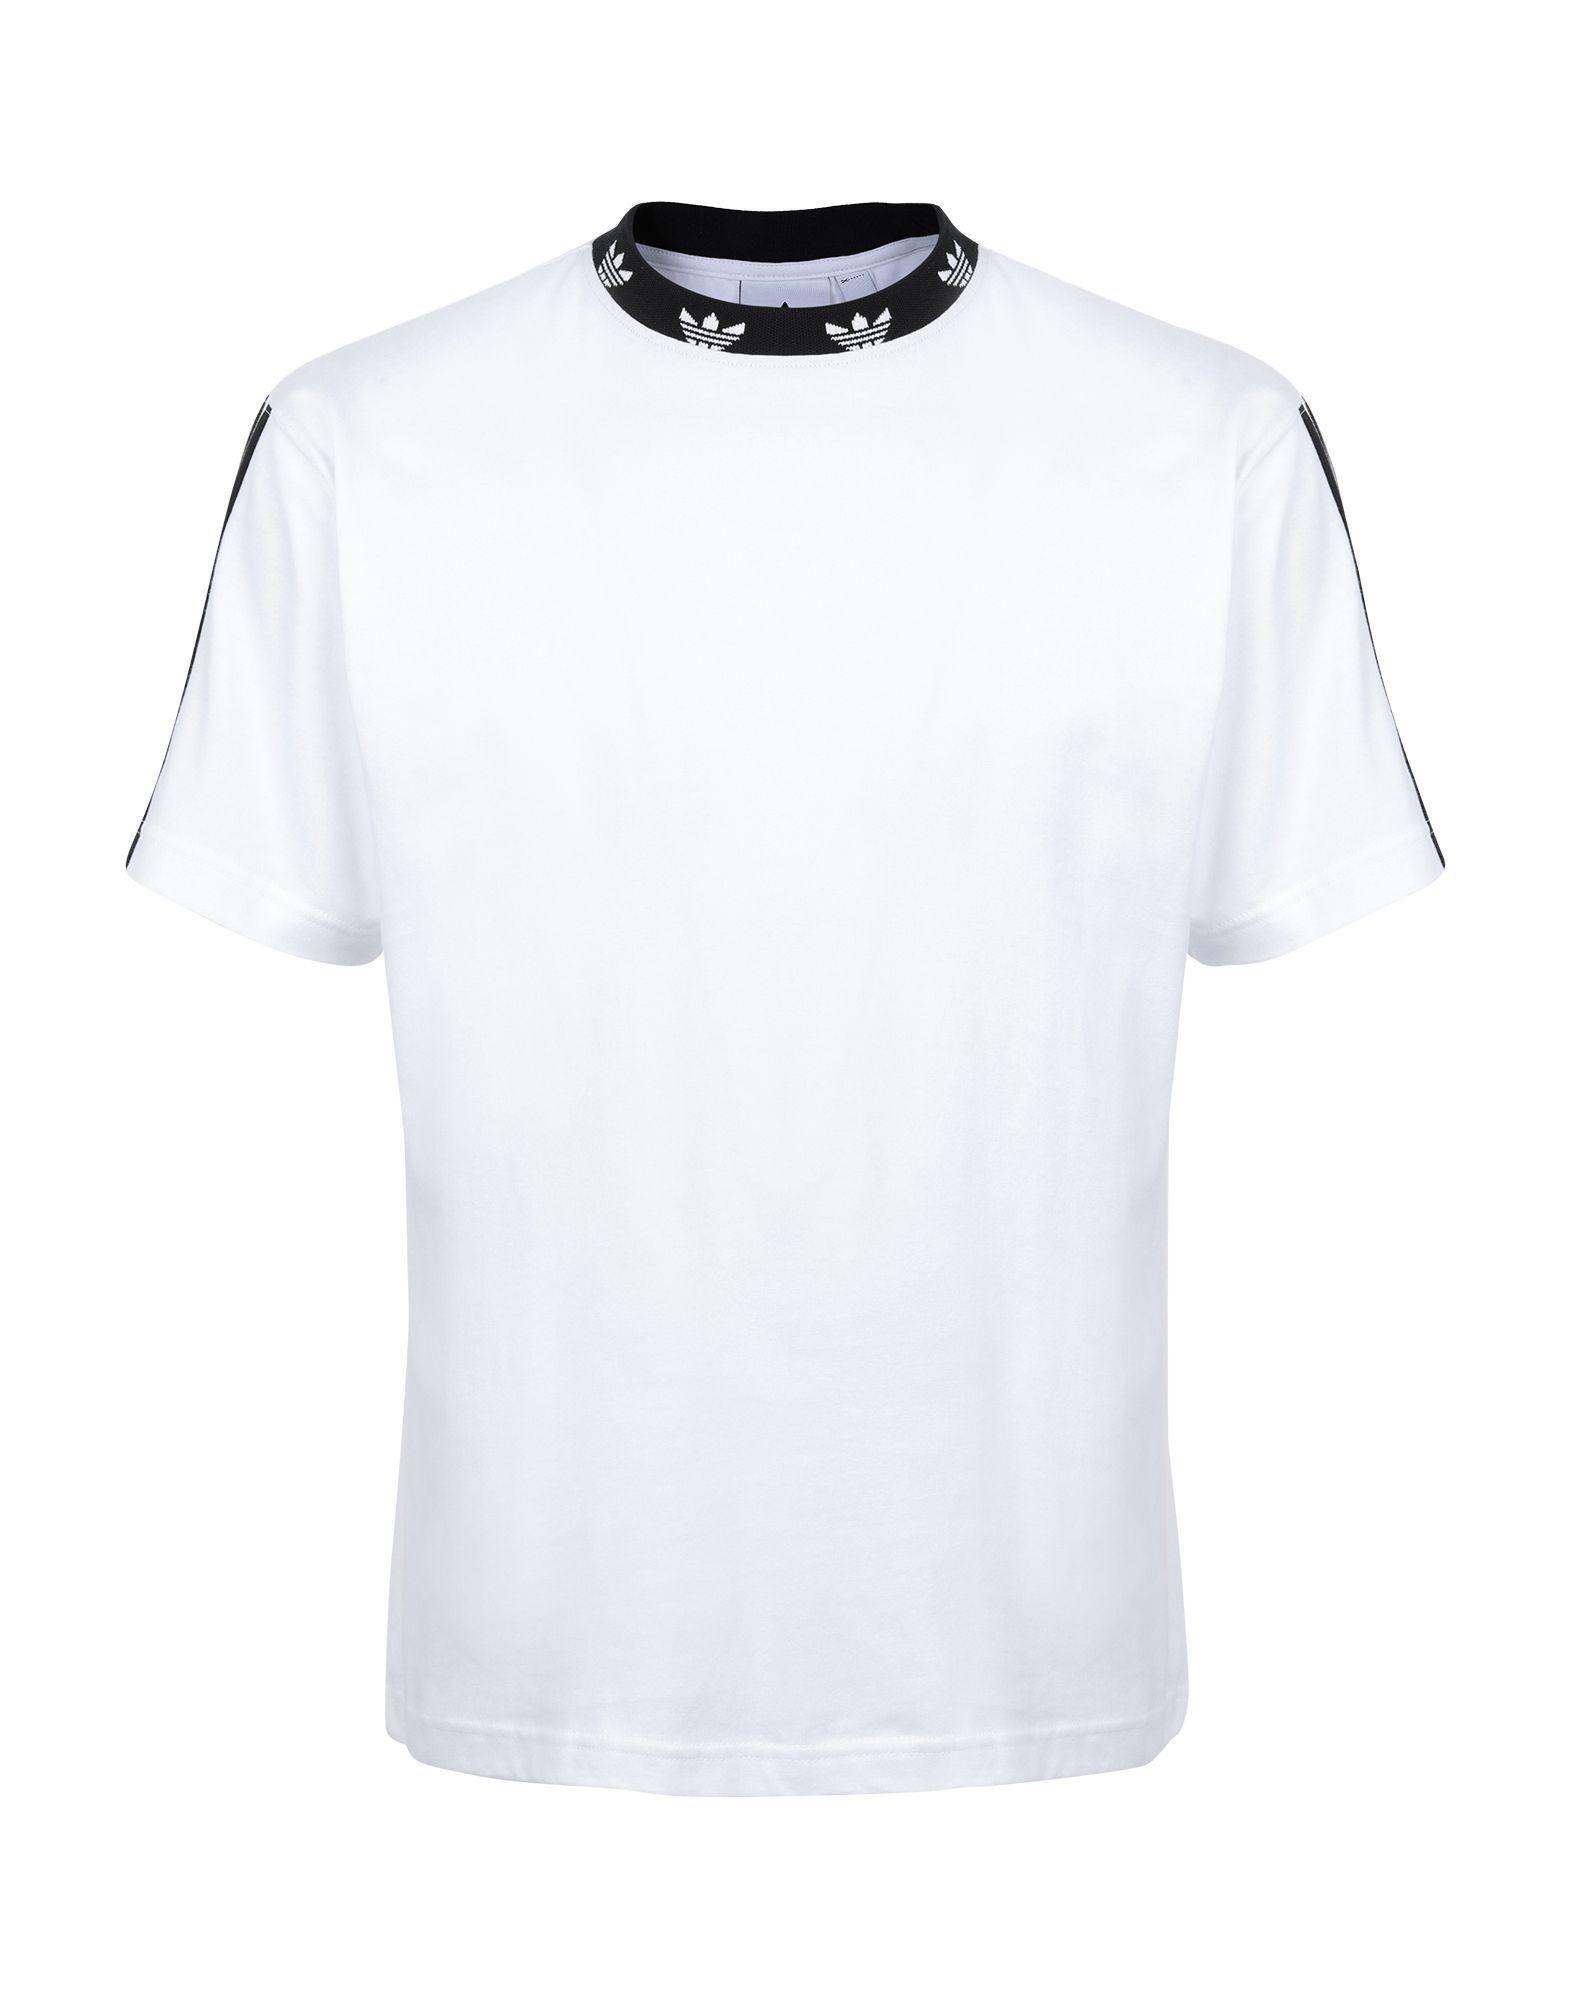 T-Shirt Sportiva Adidas Originals Trefoil Rib Tee - herren - 12357895CC